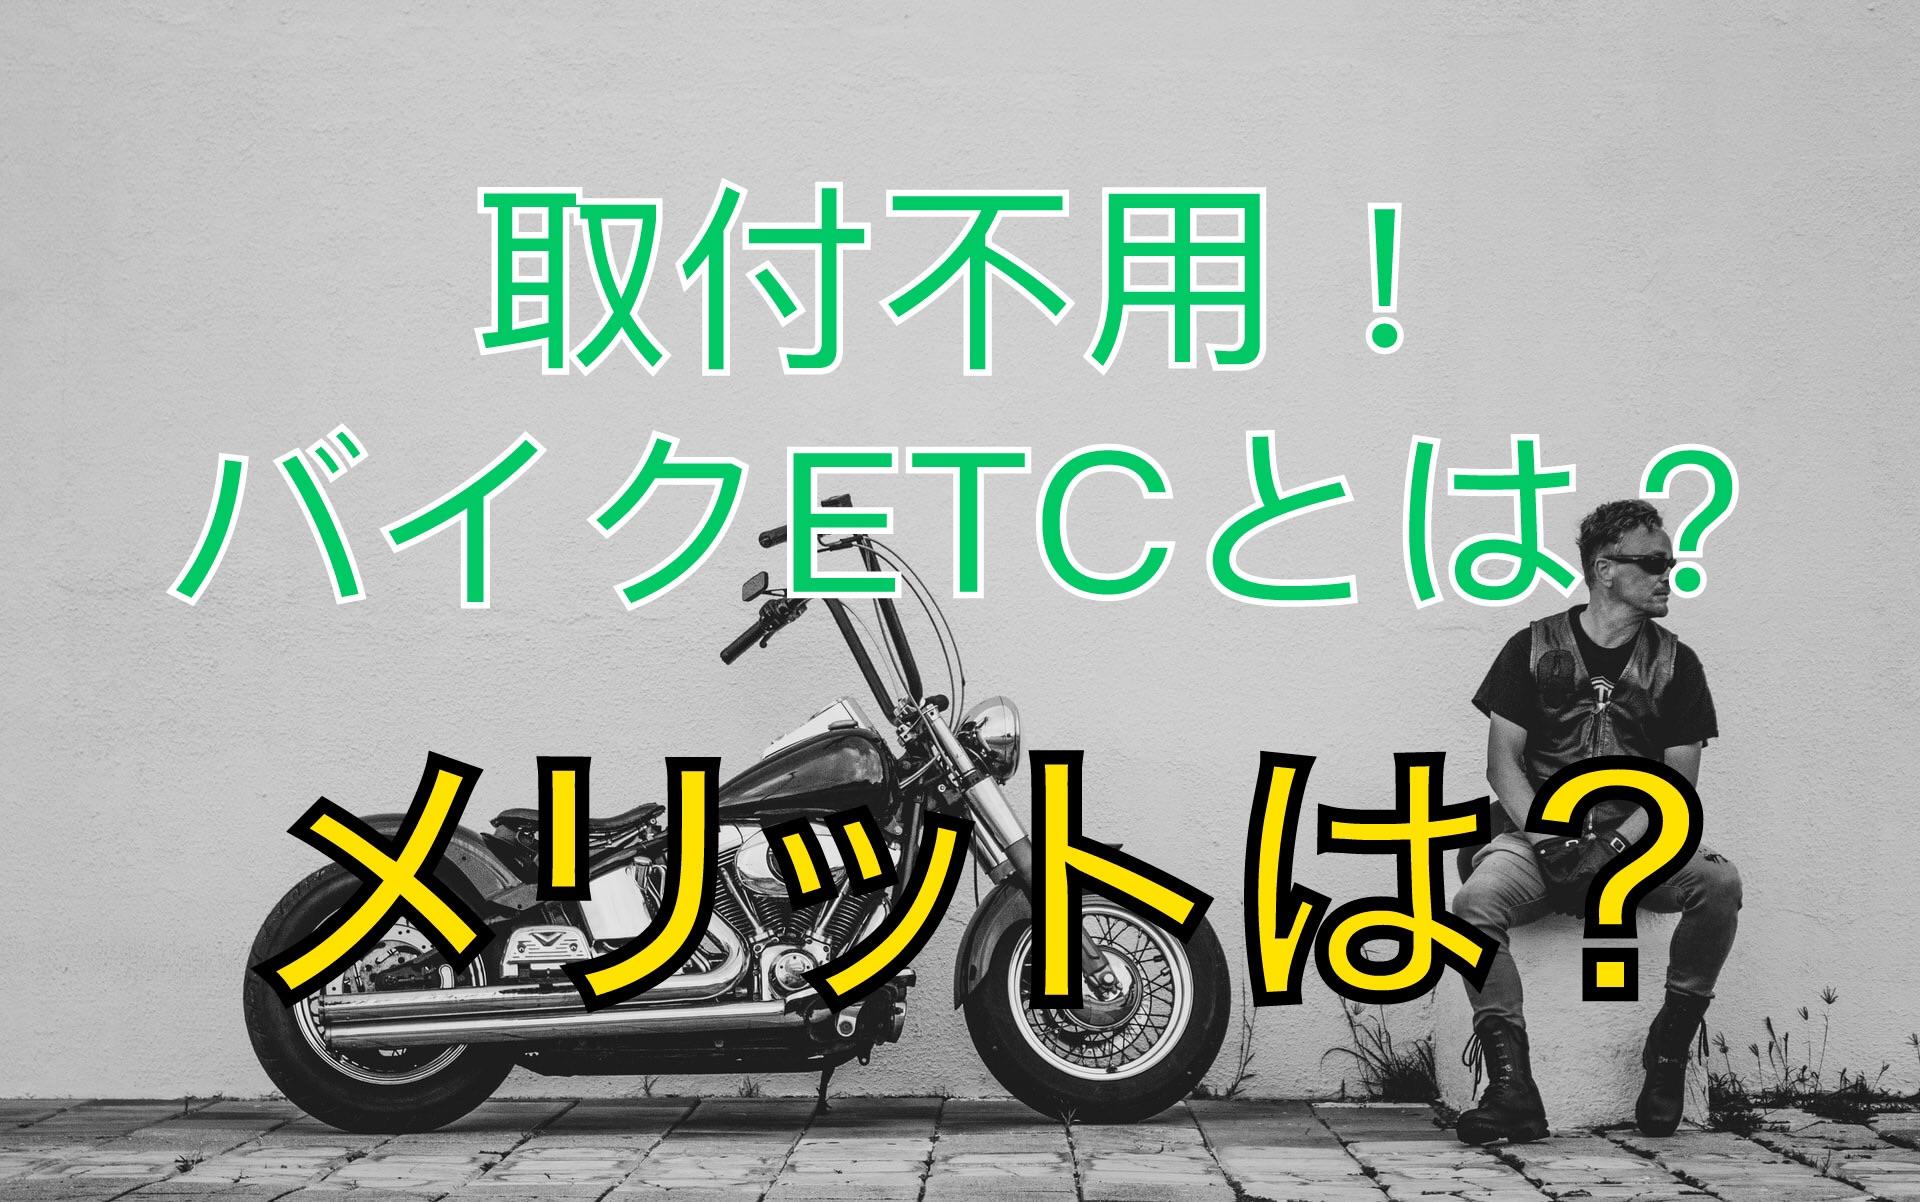 Etc バイク